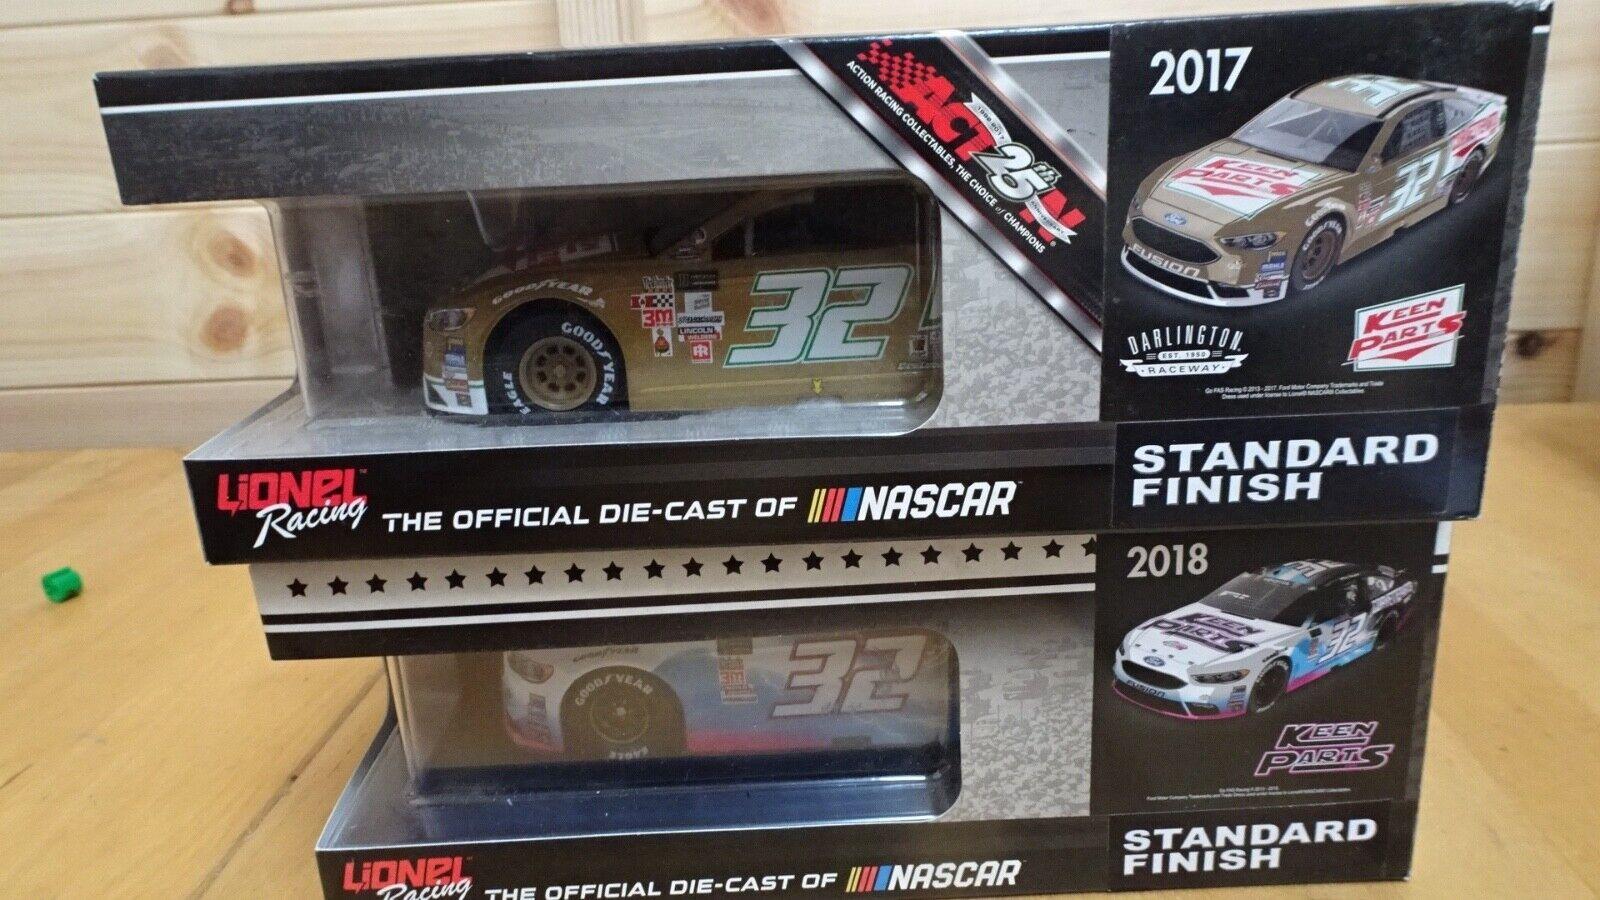 2017 2018 1 24 NASCAR DIECAST MATT DIBENEDETTO  ASSORTED 1 24 100 Available